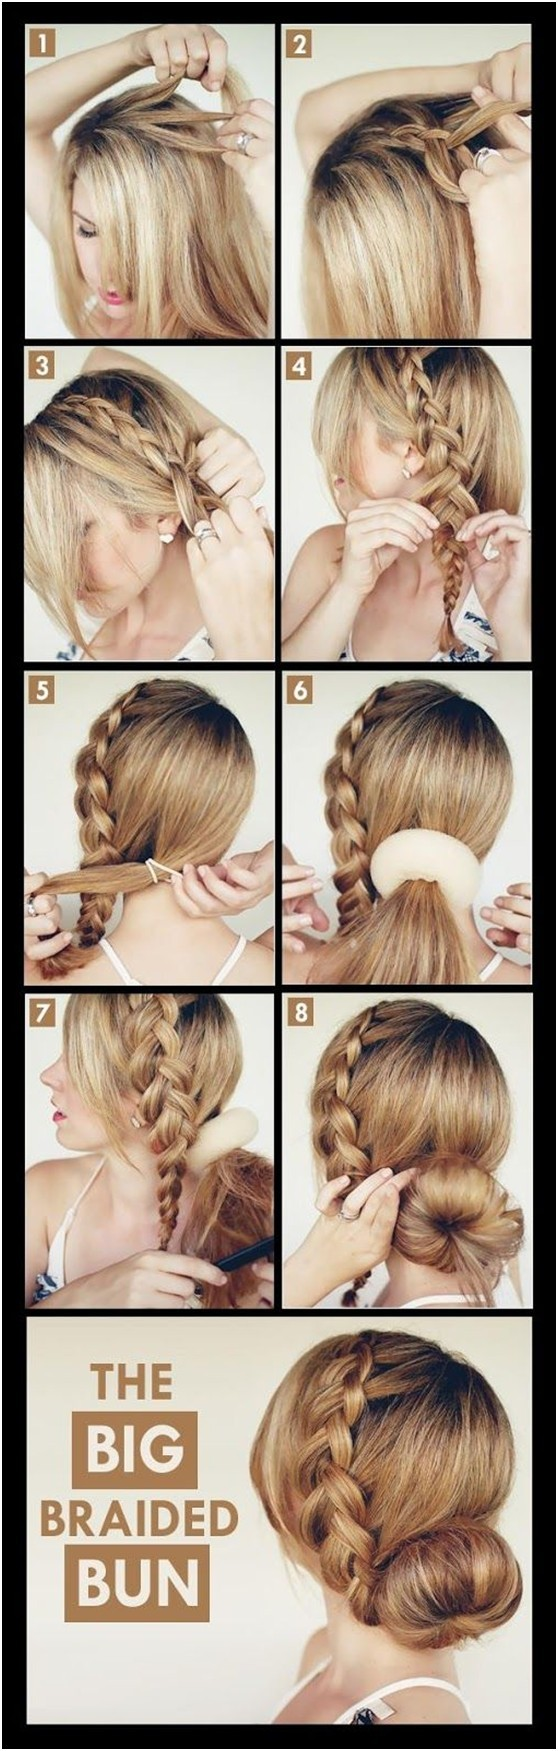 Superb 15 Braided Updo Hairstyles Tutorials Pretty Designs Short Hairstyles For Black Women Fulllsitofus